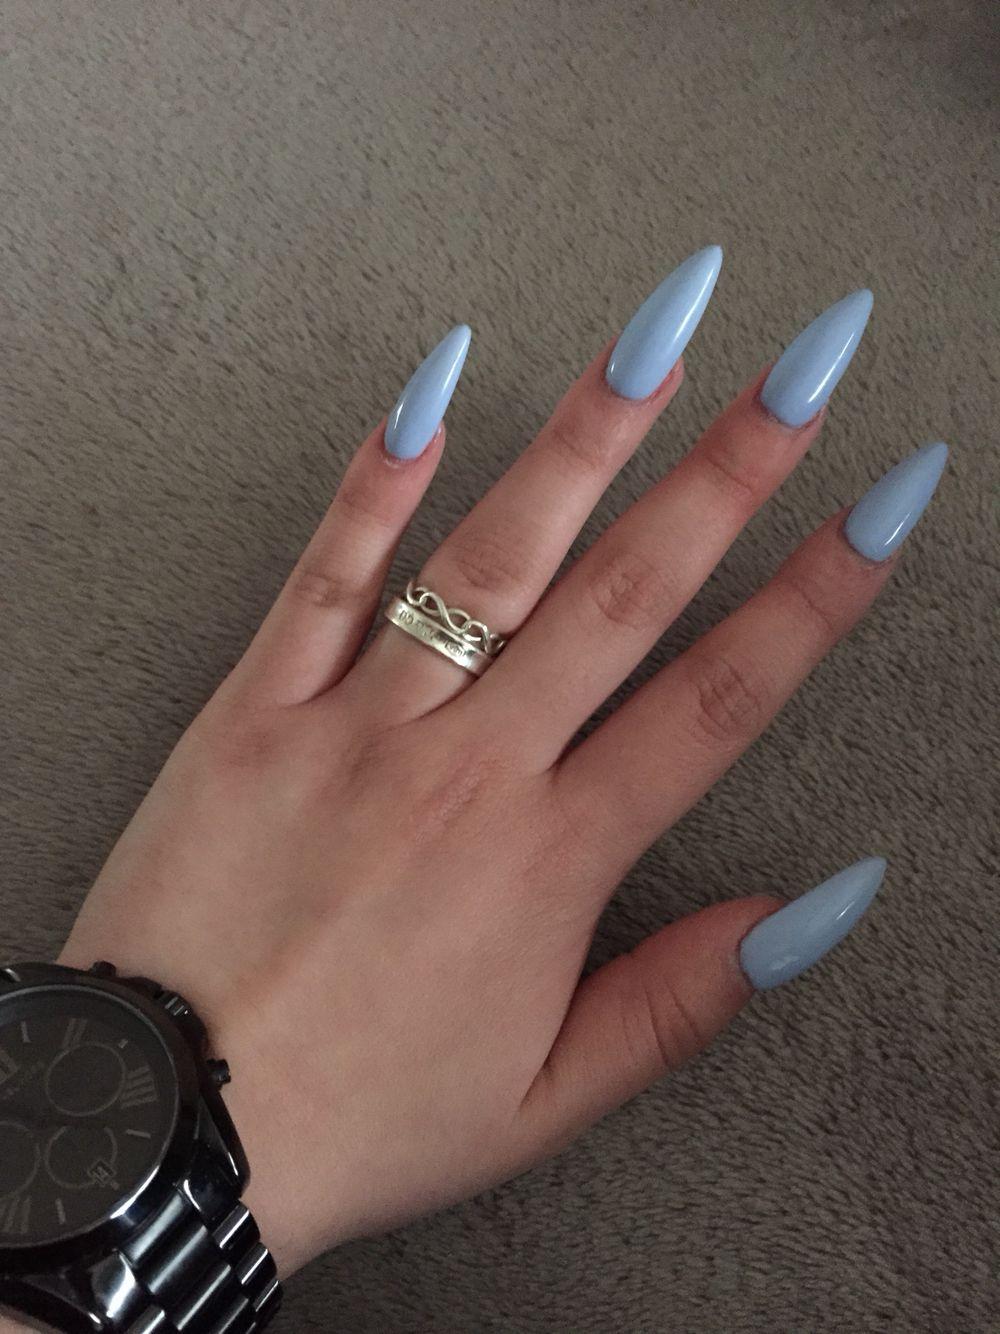 Pin by tati cardoso on Nails | Pinterest | Nuggwifee, Baby blue ...